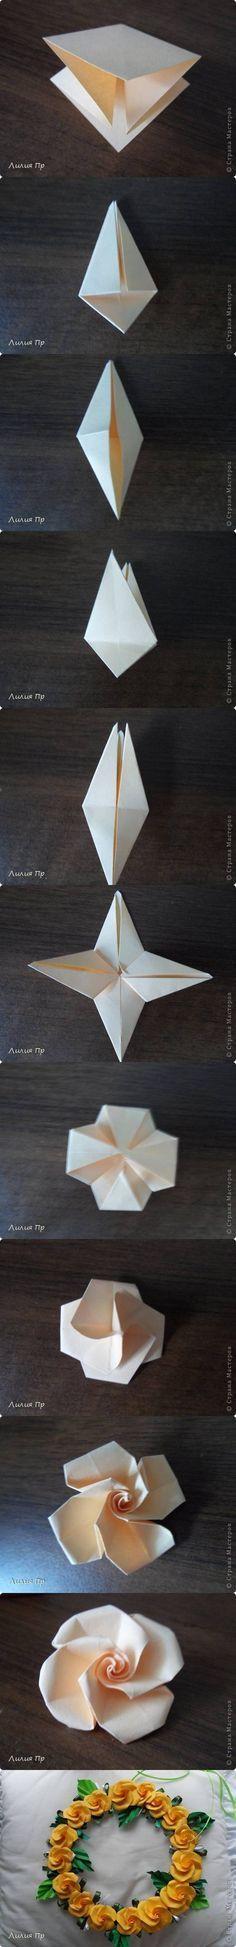 How to DIY Beautiful Origami Rose #DIY #craft #Origami